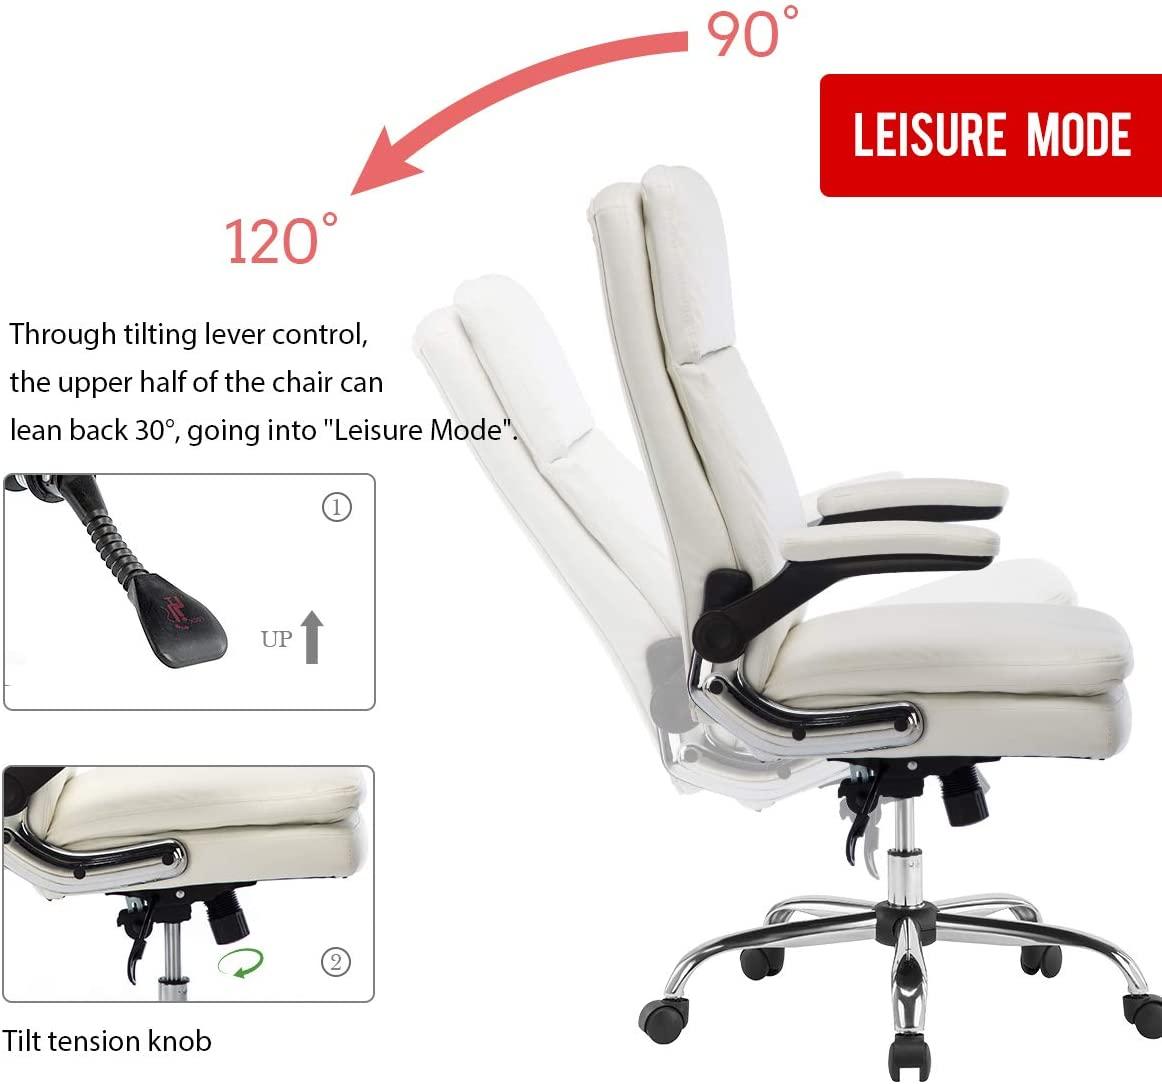 kerms reclining chair details